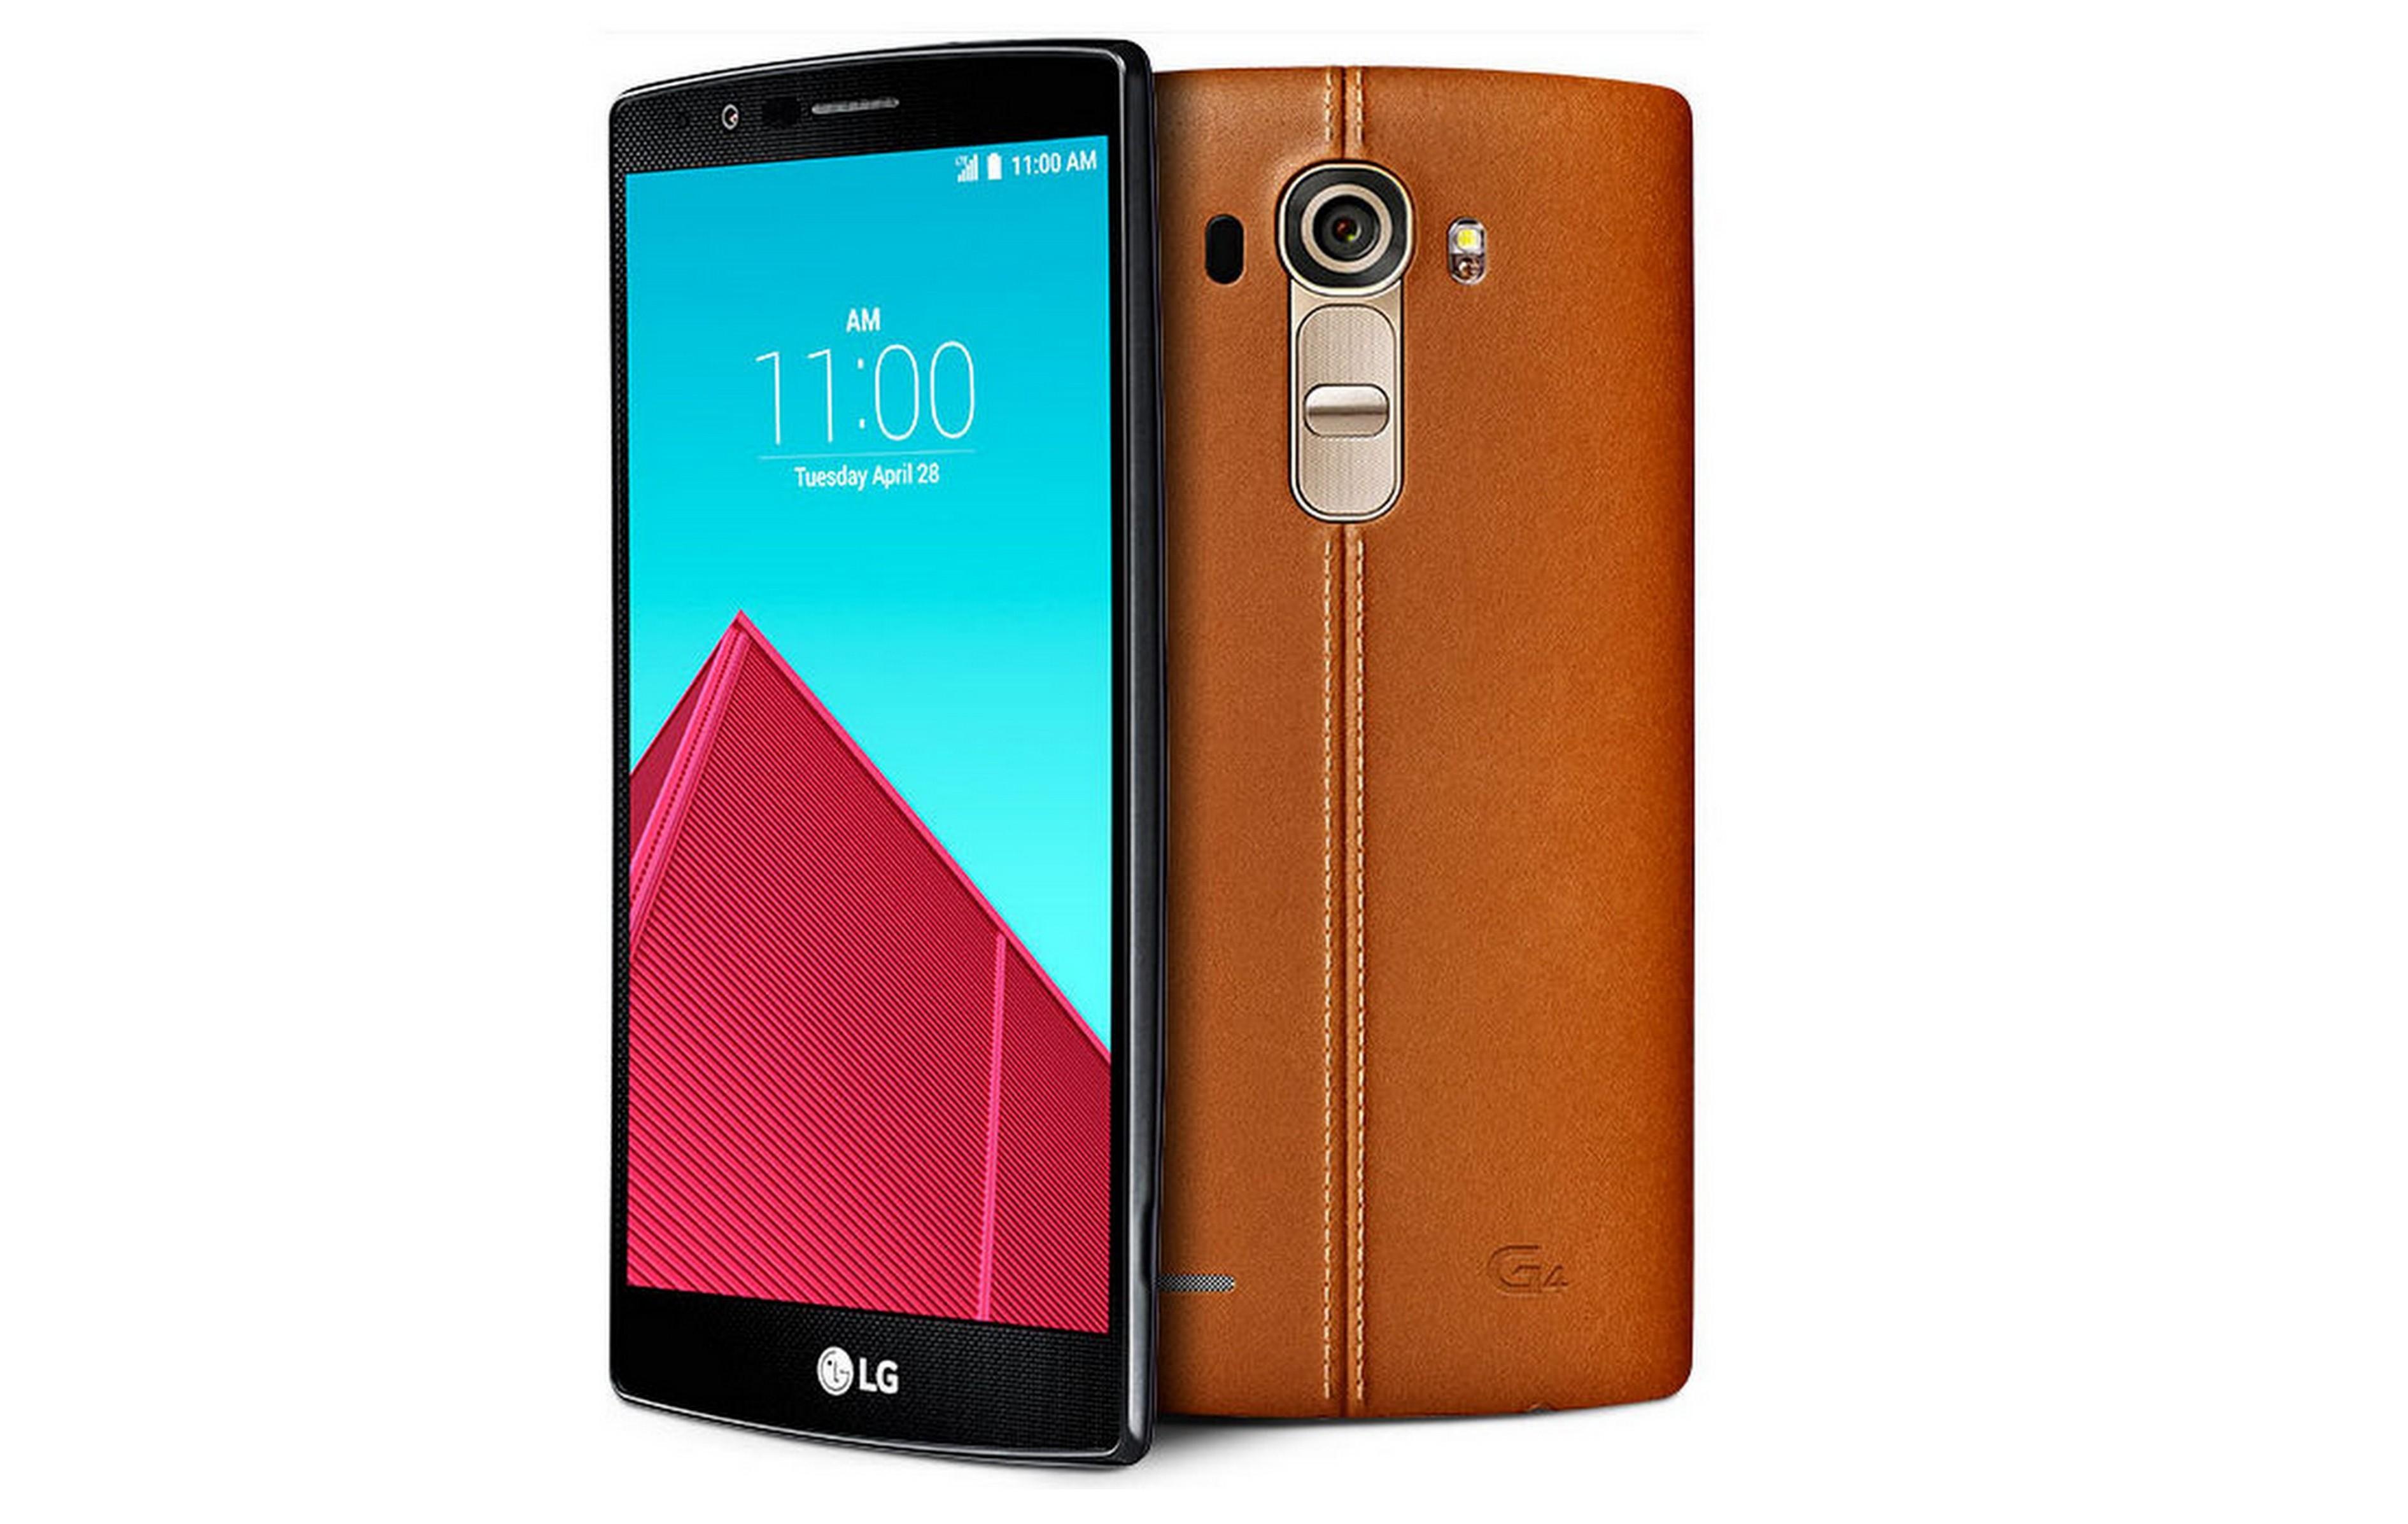 ec1708b0296bf2 LG G4 Review: Built for Power Users - Tom's Guide | Tom's Guide